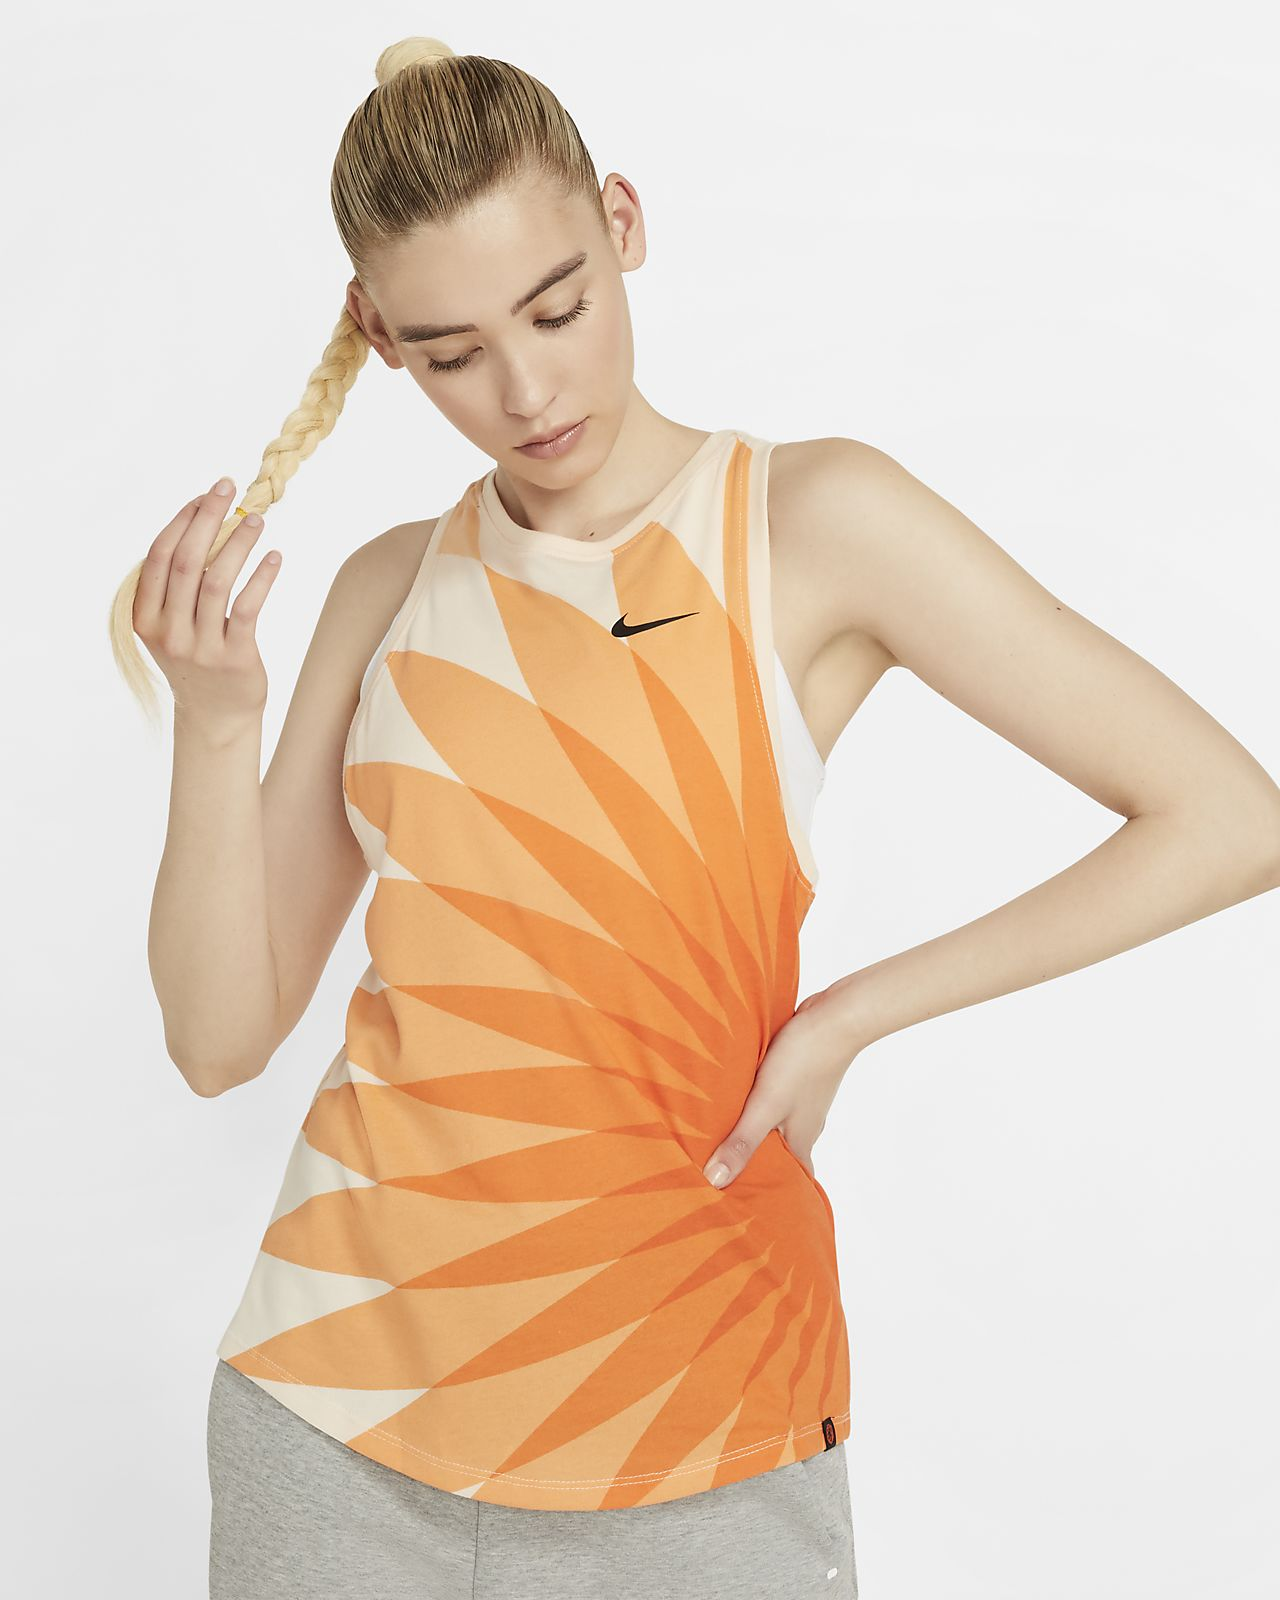 Camiseta de tirantes para mujer Netherlands